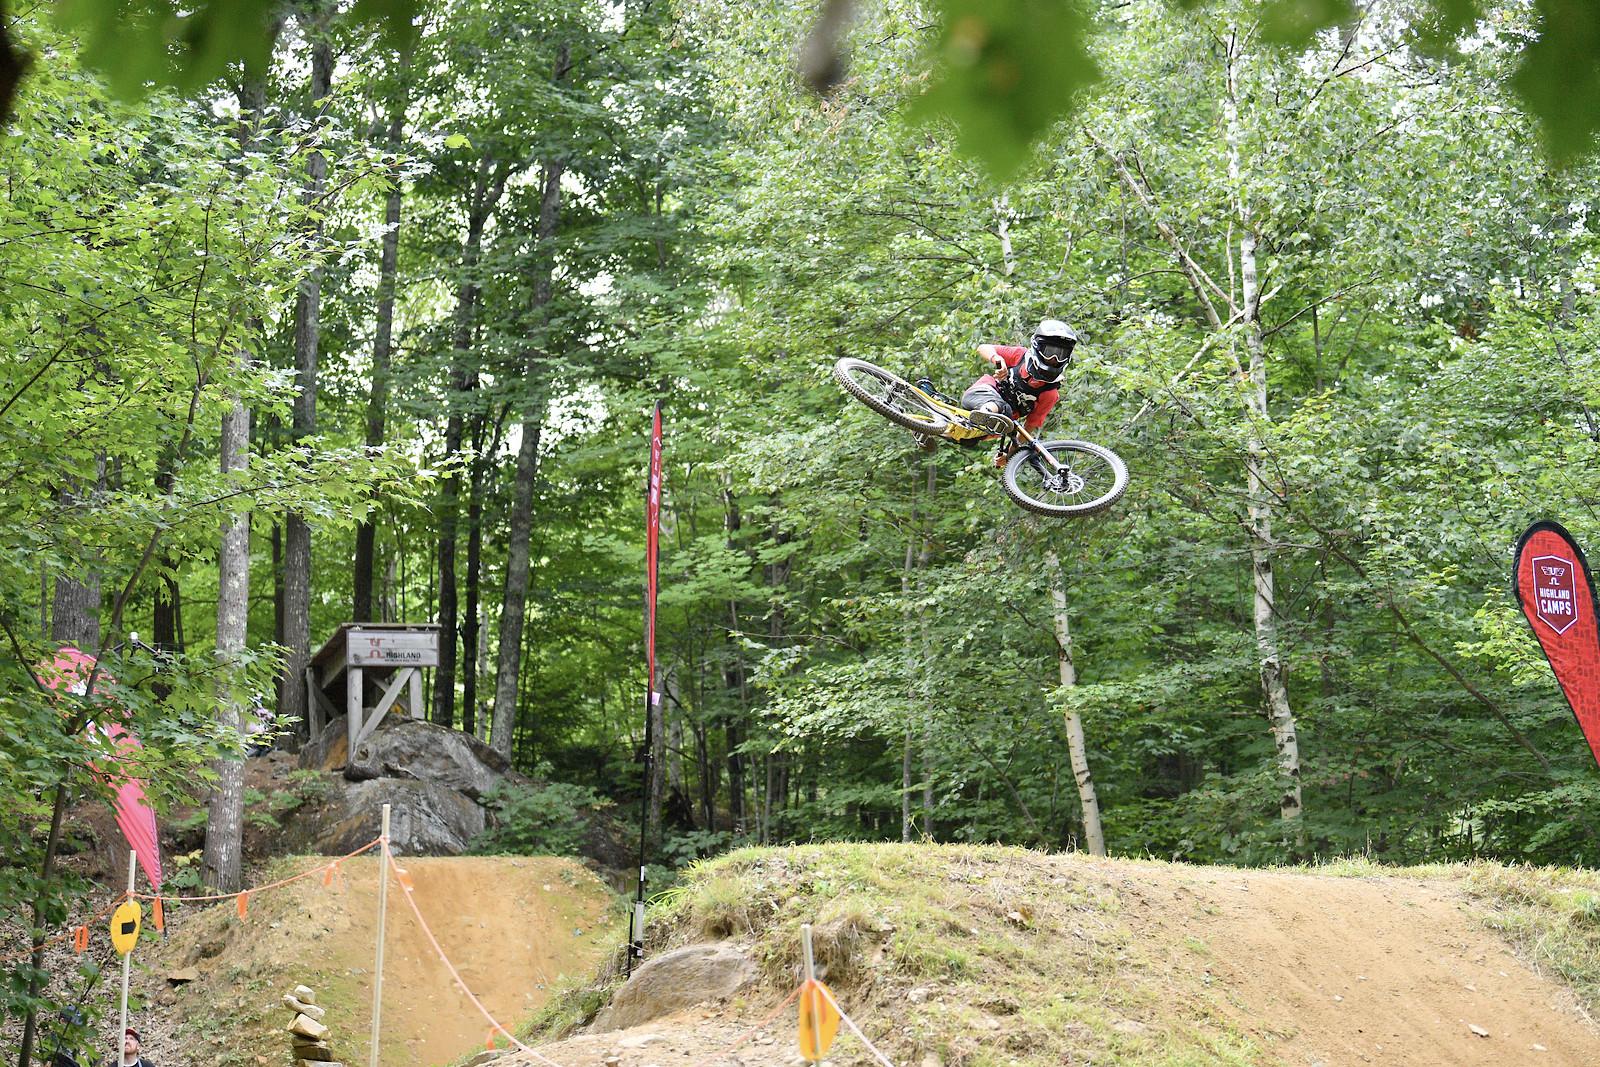 DSC 1131 - locotiki - Mountain Biking Pictures - Vital MTB